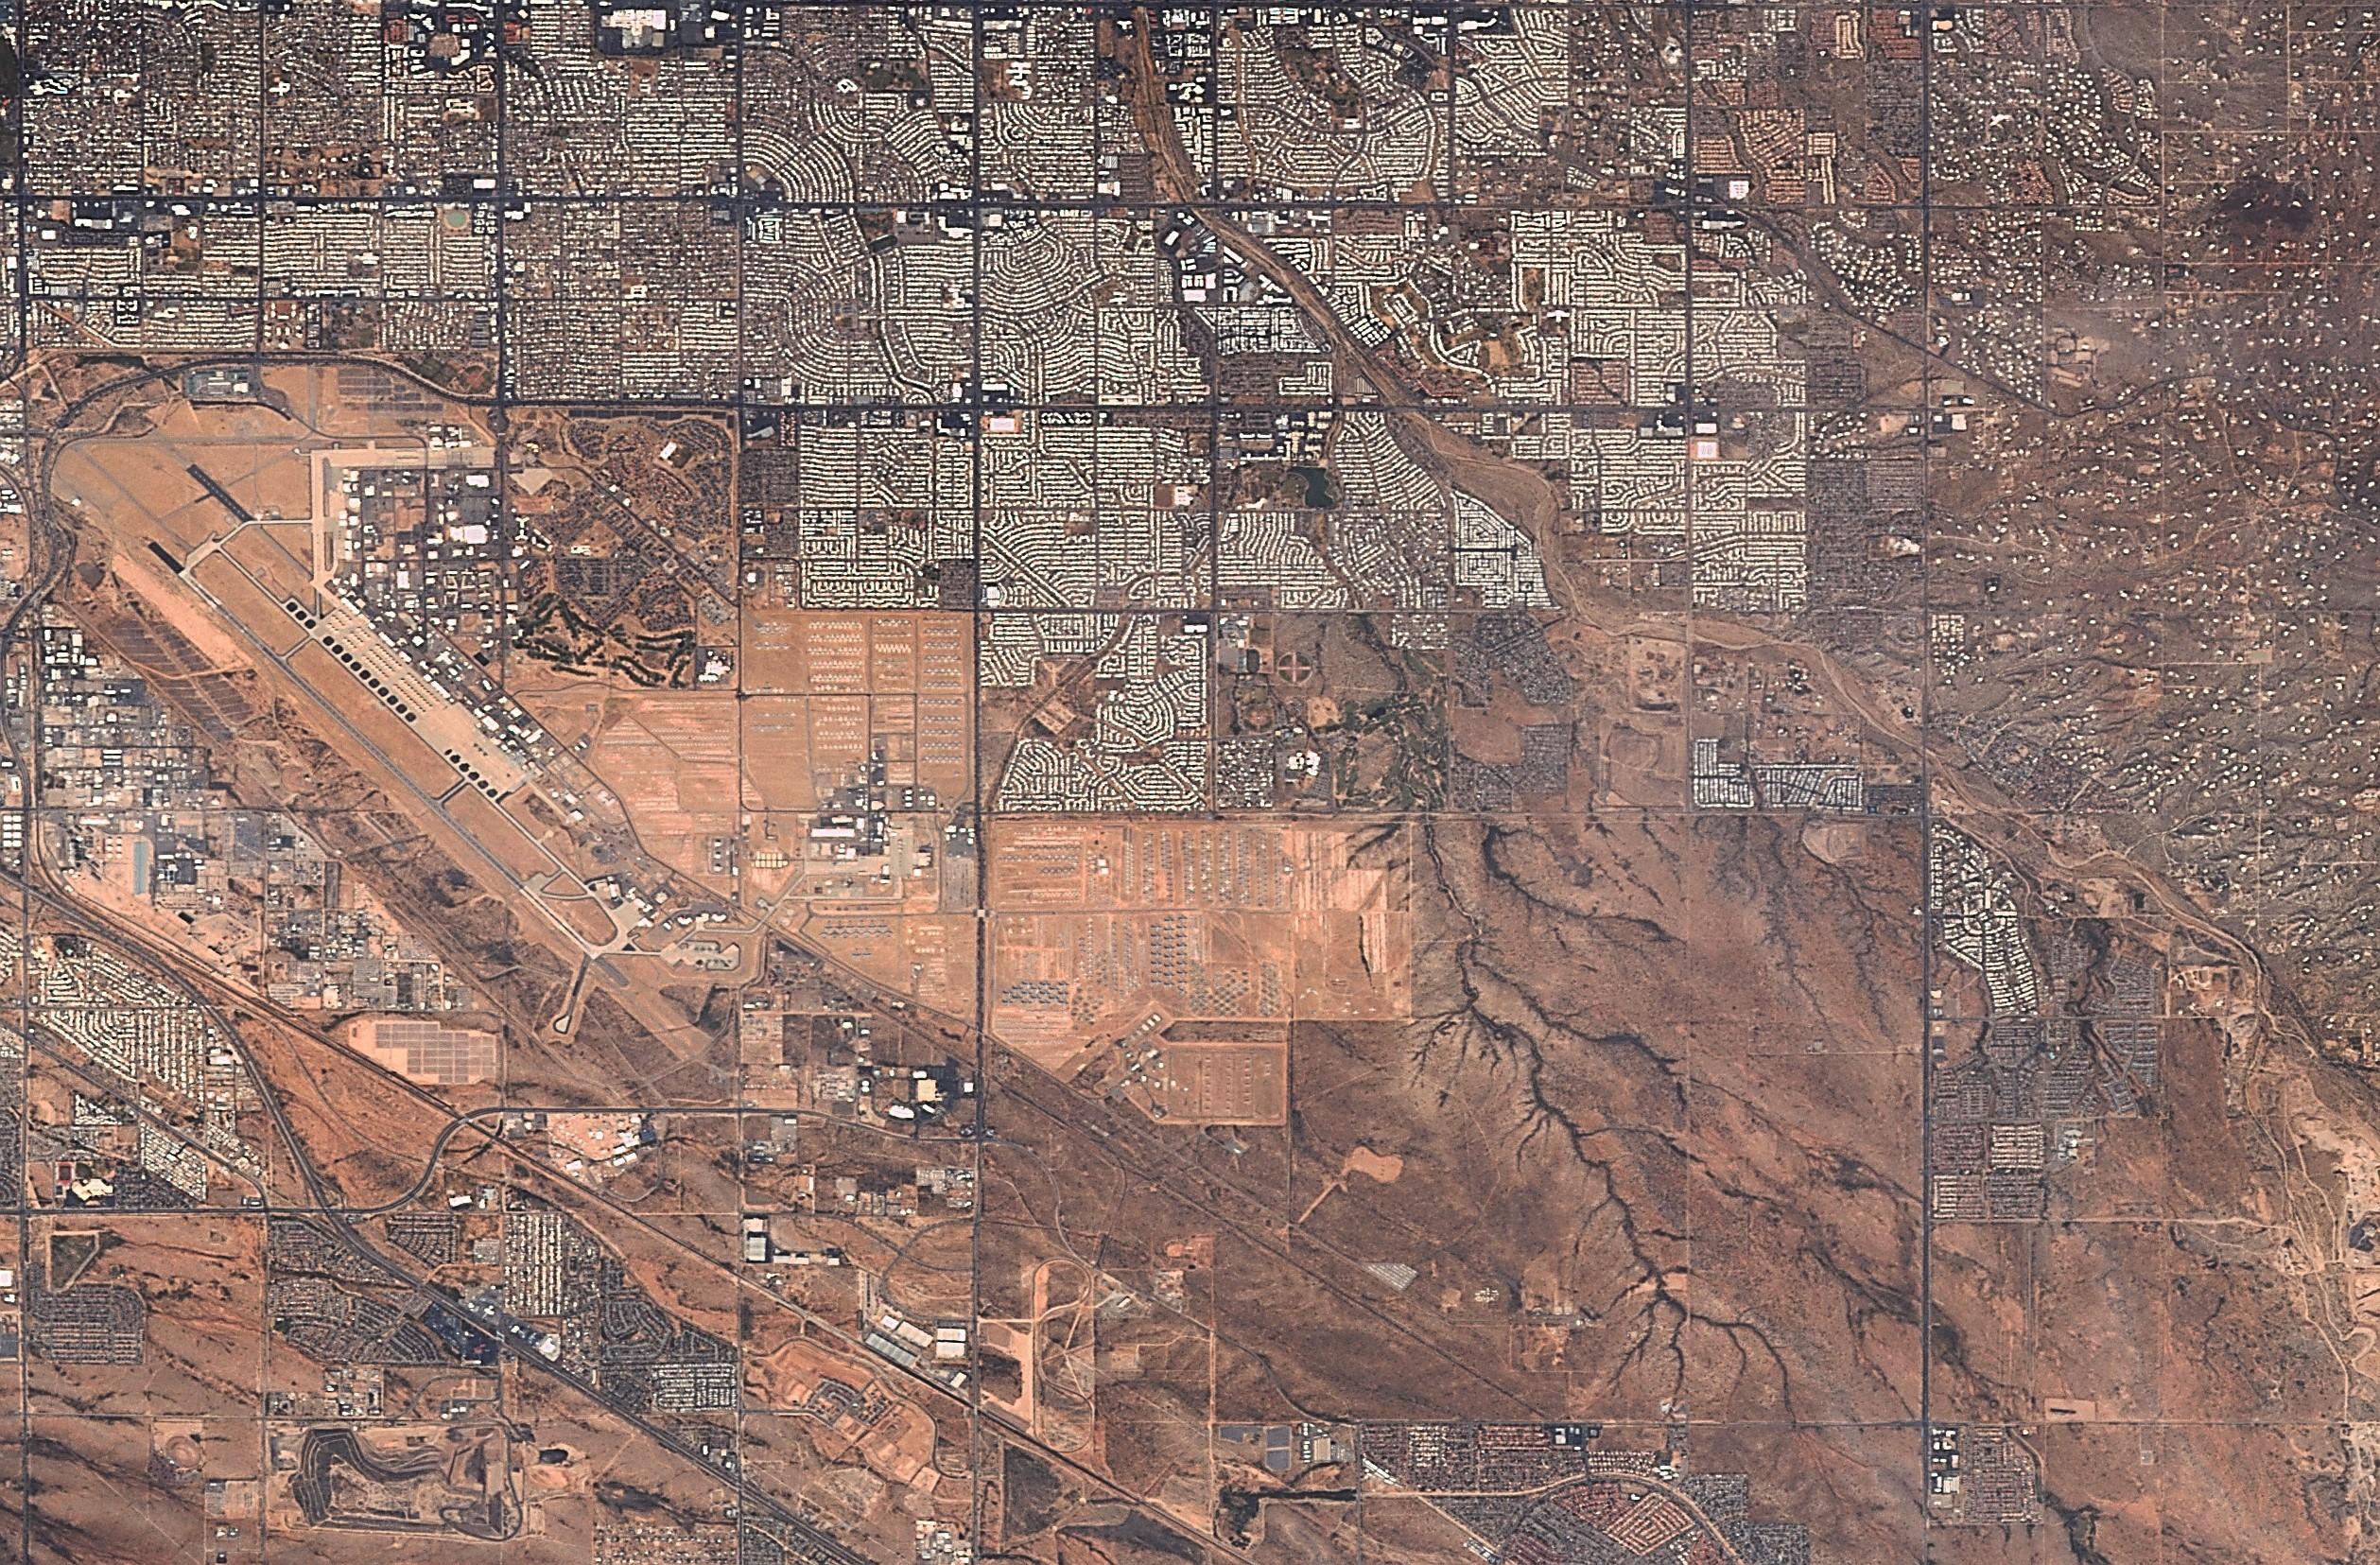 Tucson Uçak Mezarlığı Arizona 15 Ekim 2017